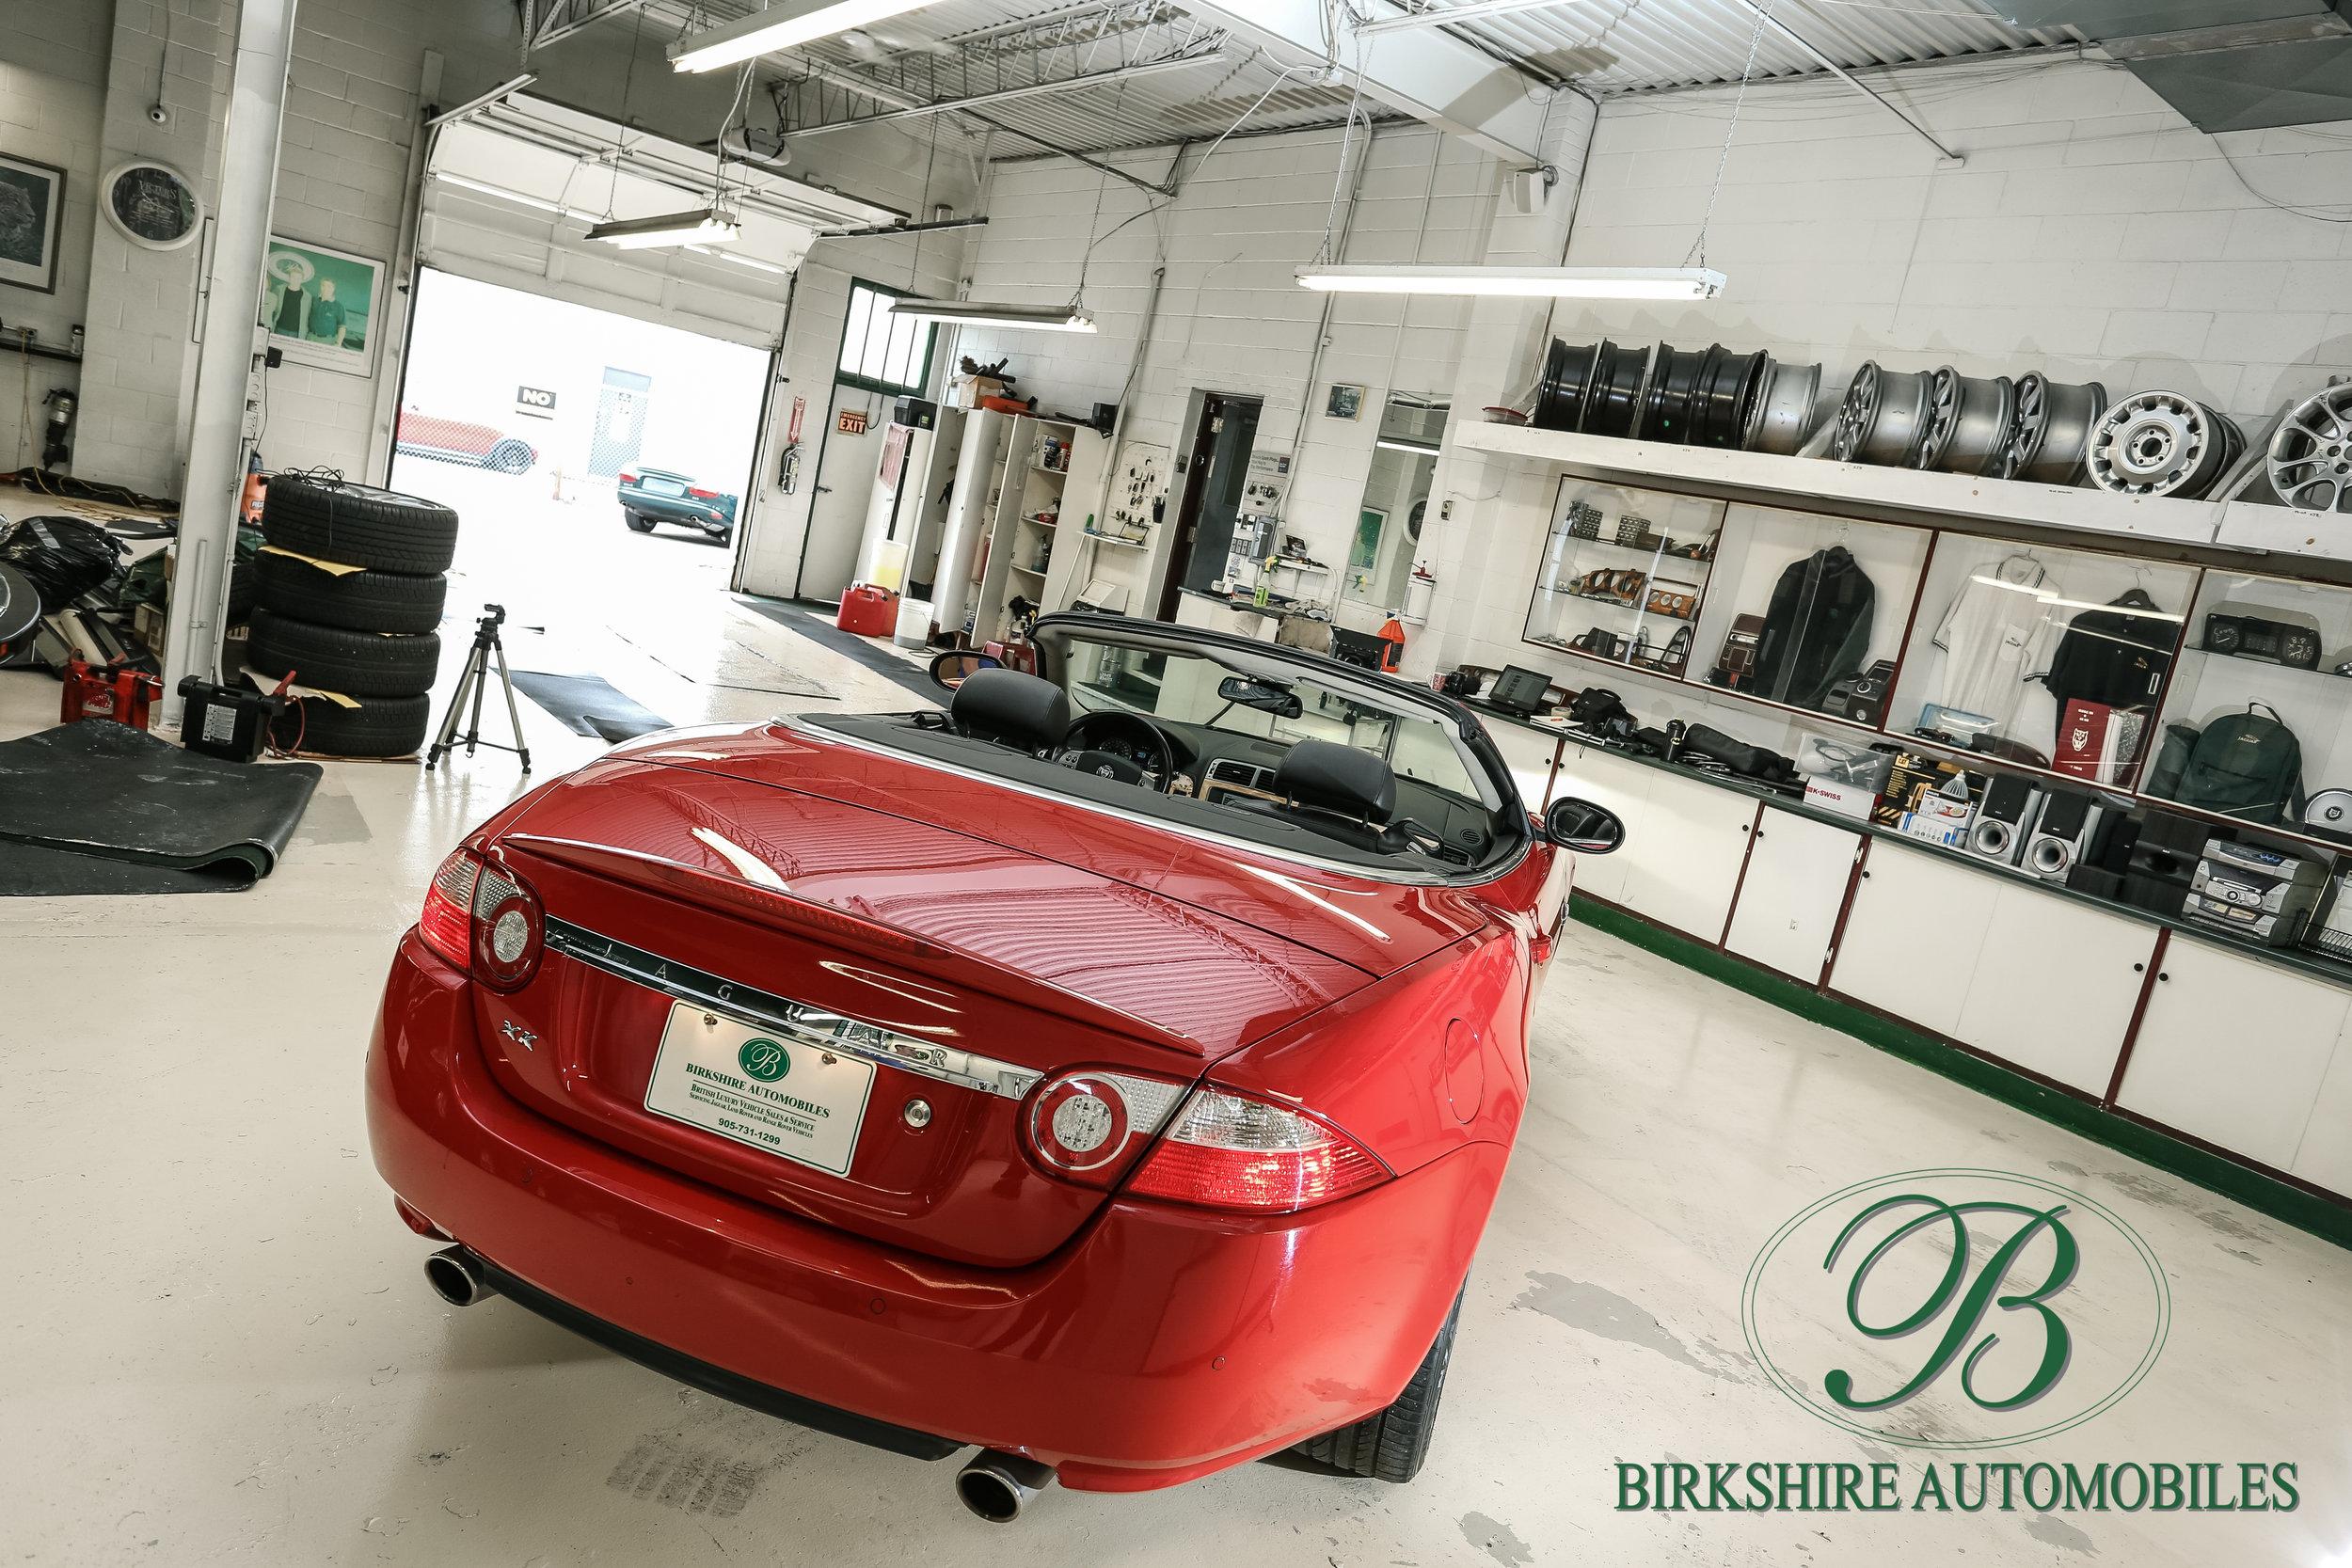 Birkshire Automobiles-80.jpg